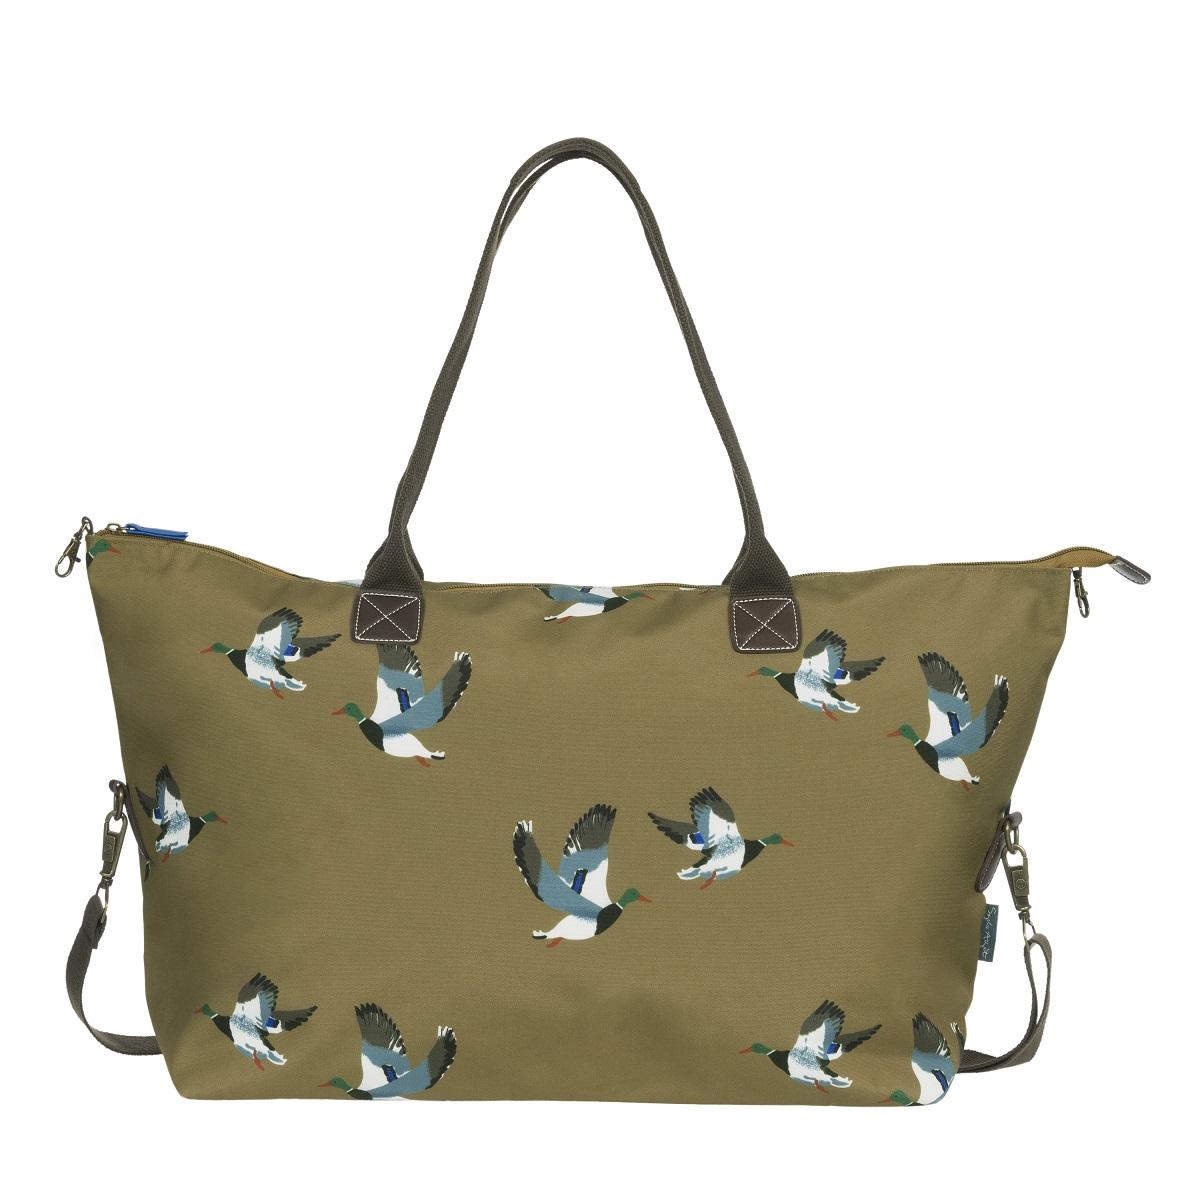 13. Sophie Allport Ducks Weekend Oundle Bag